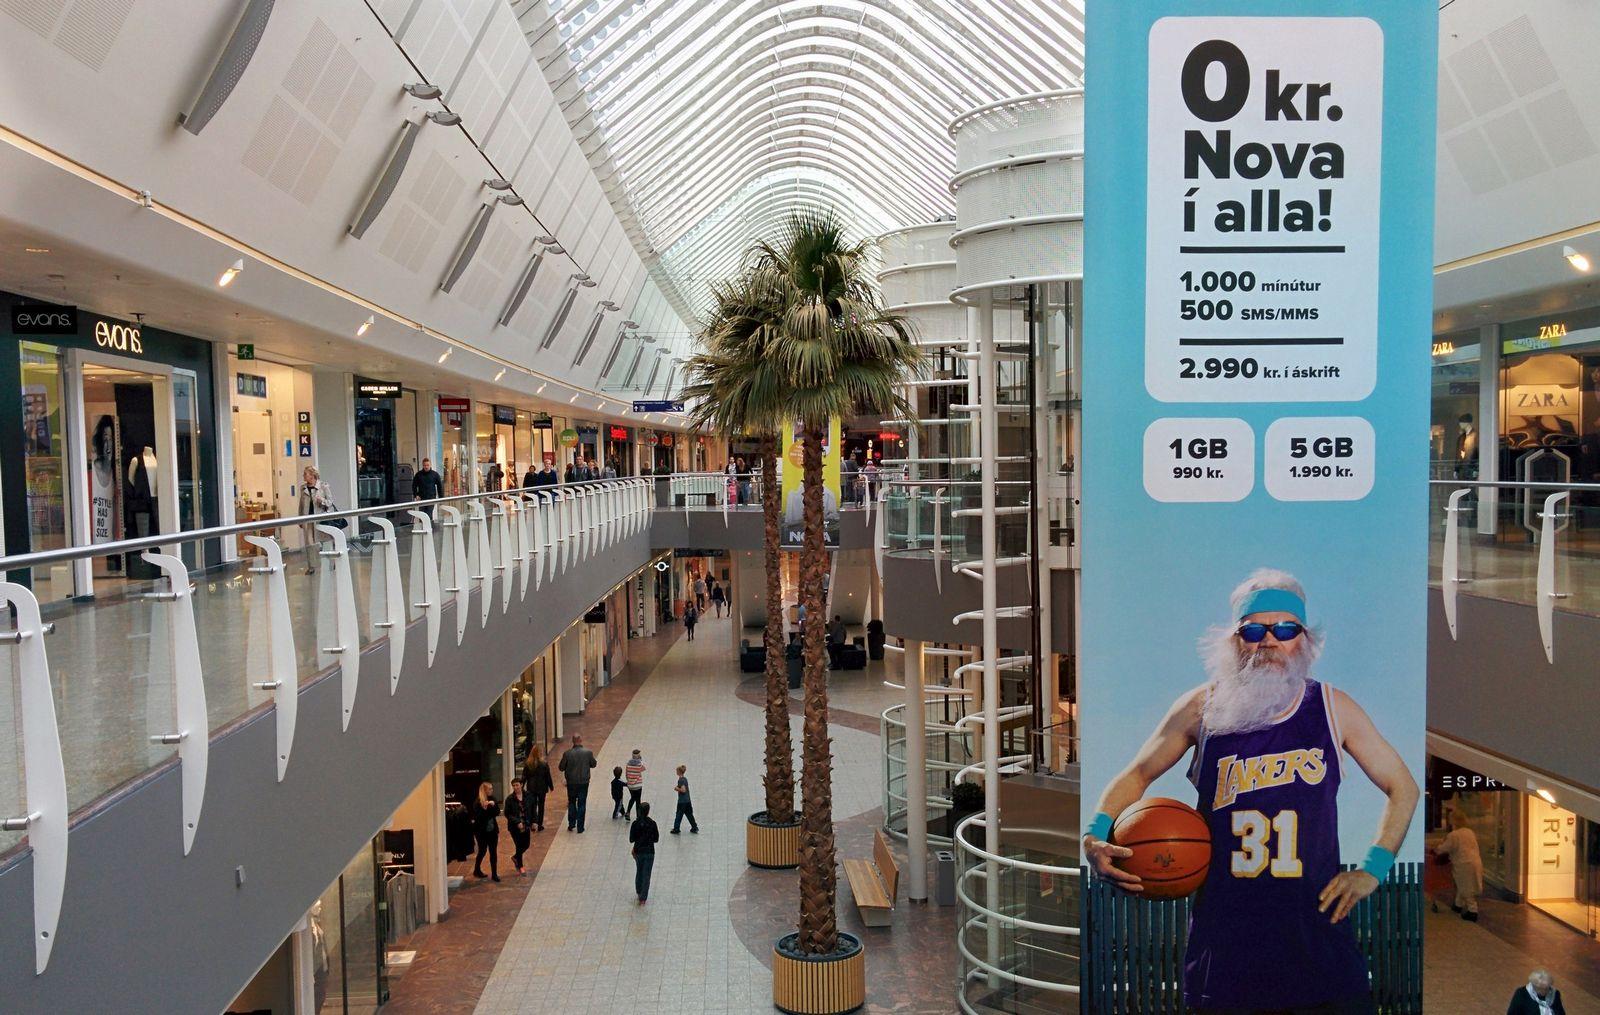 Centro comercial Smaralind